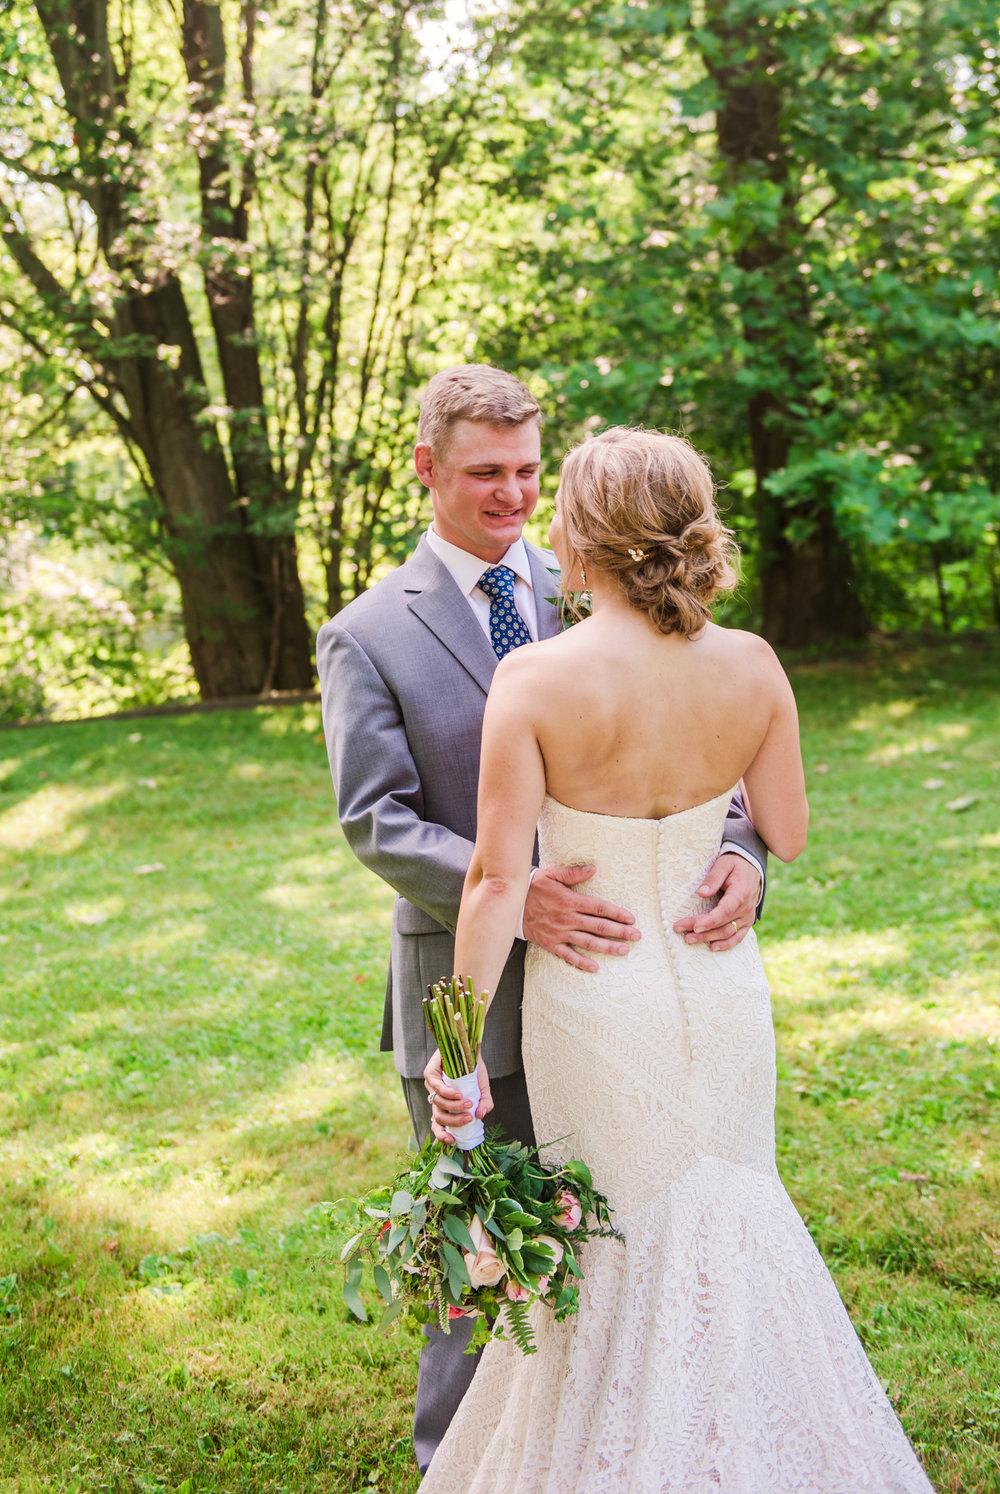 JILLSTUDIO_Toganenwood_Estate_Rochester_Wedding_Rochester_NY_Photographer_DSC_6345.jpg